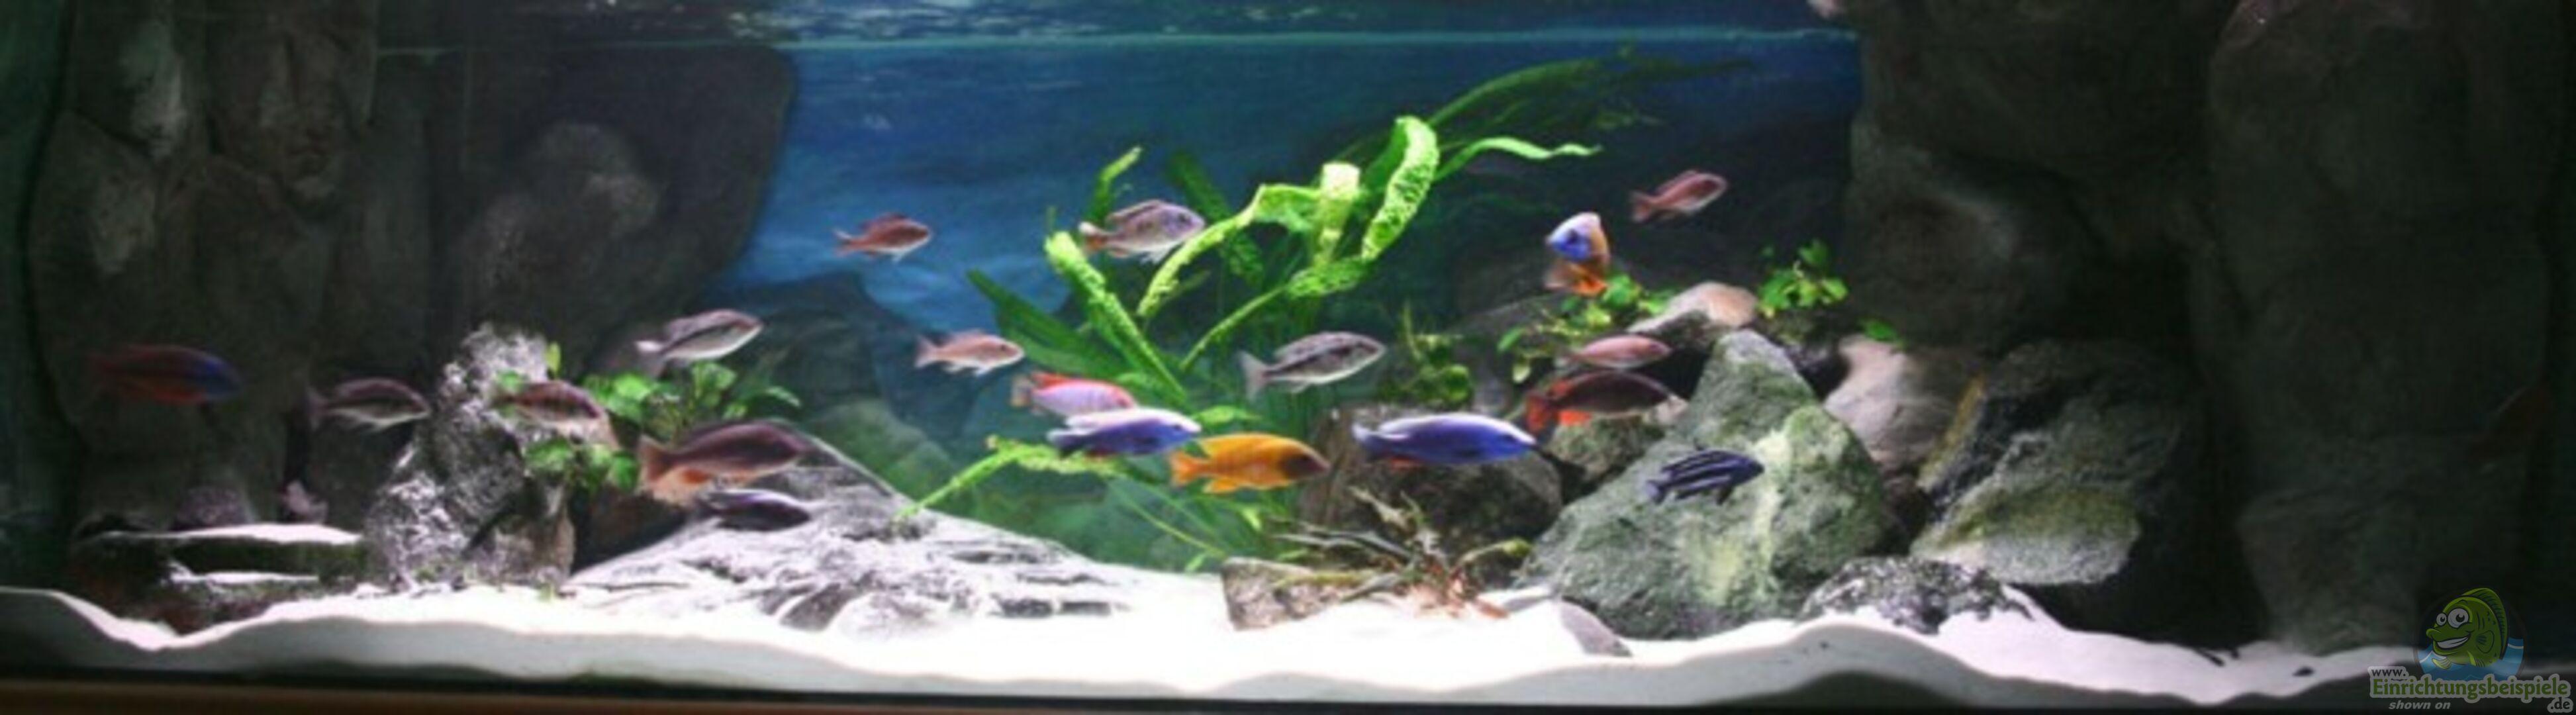 aquarium von p tti becken 6940. Black Bedroom Furniture Sets. Home Design Ideas